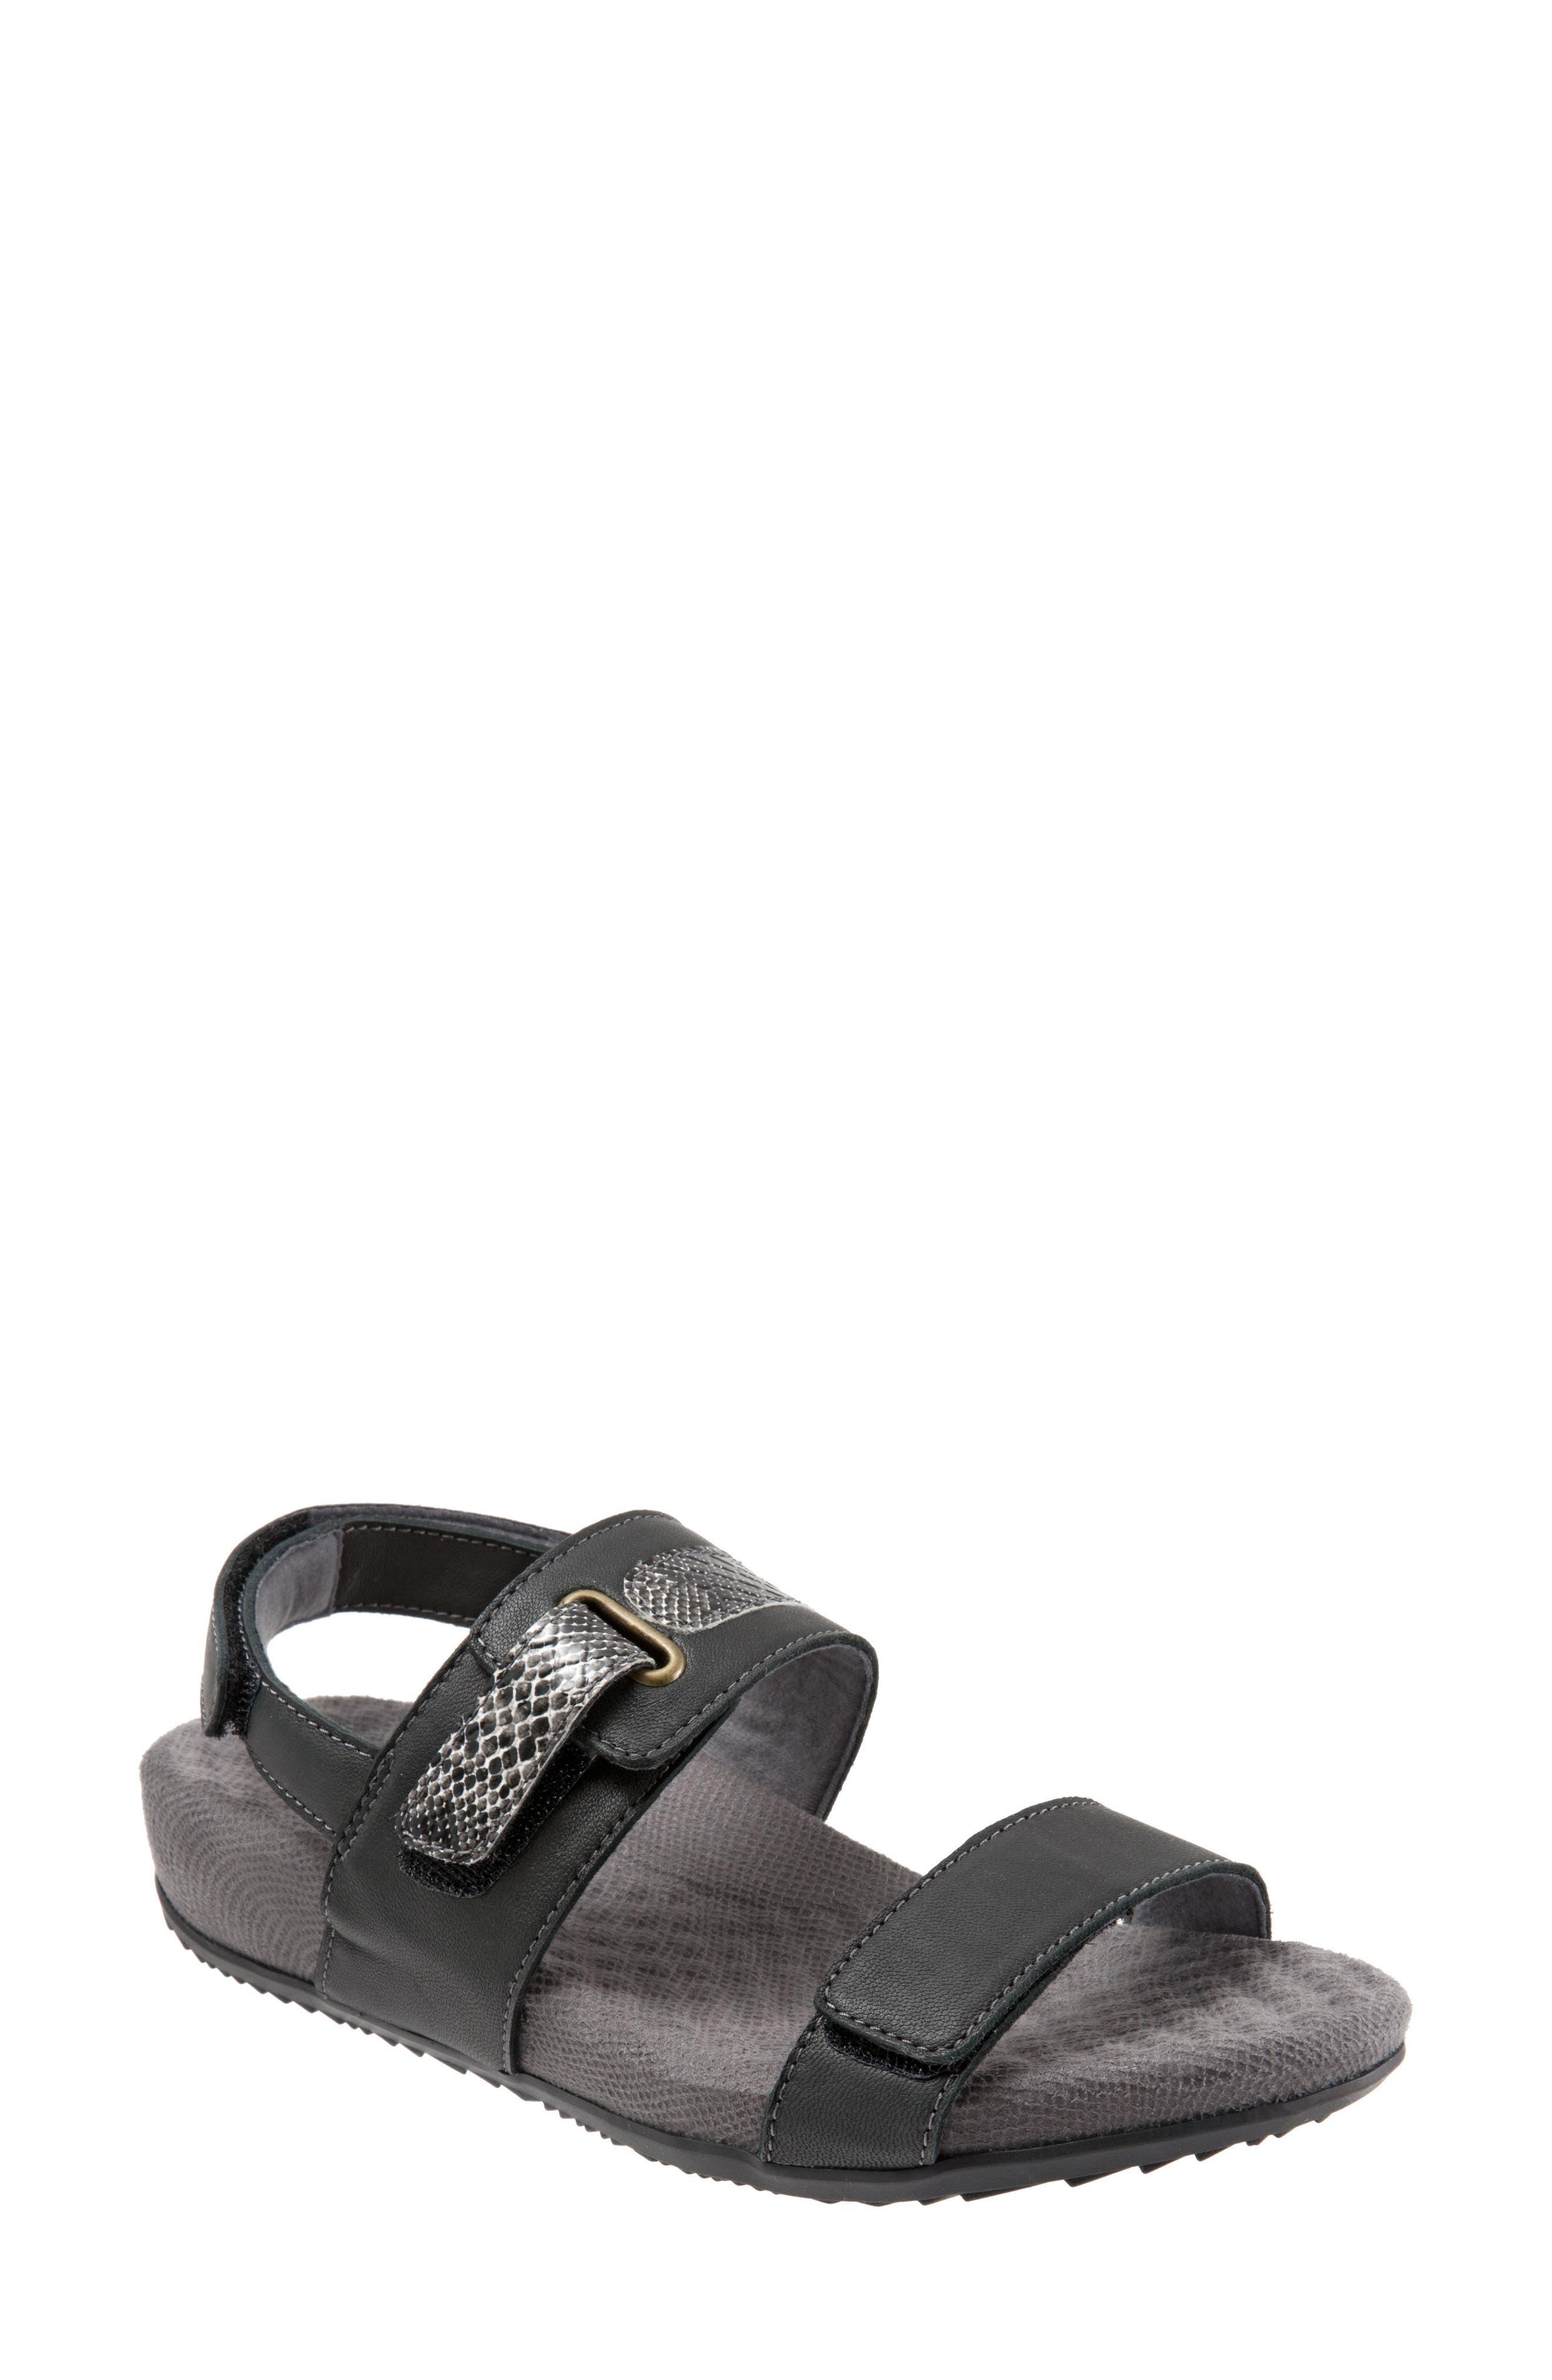 Bimmer Sandal,                             Main thumbnail 1, color,                             BLACK LEATHER